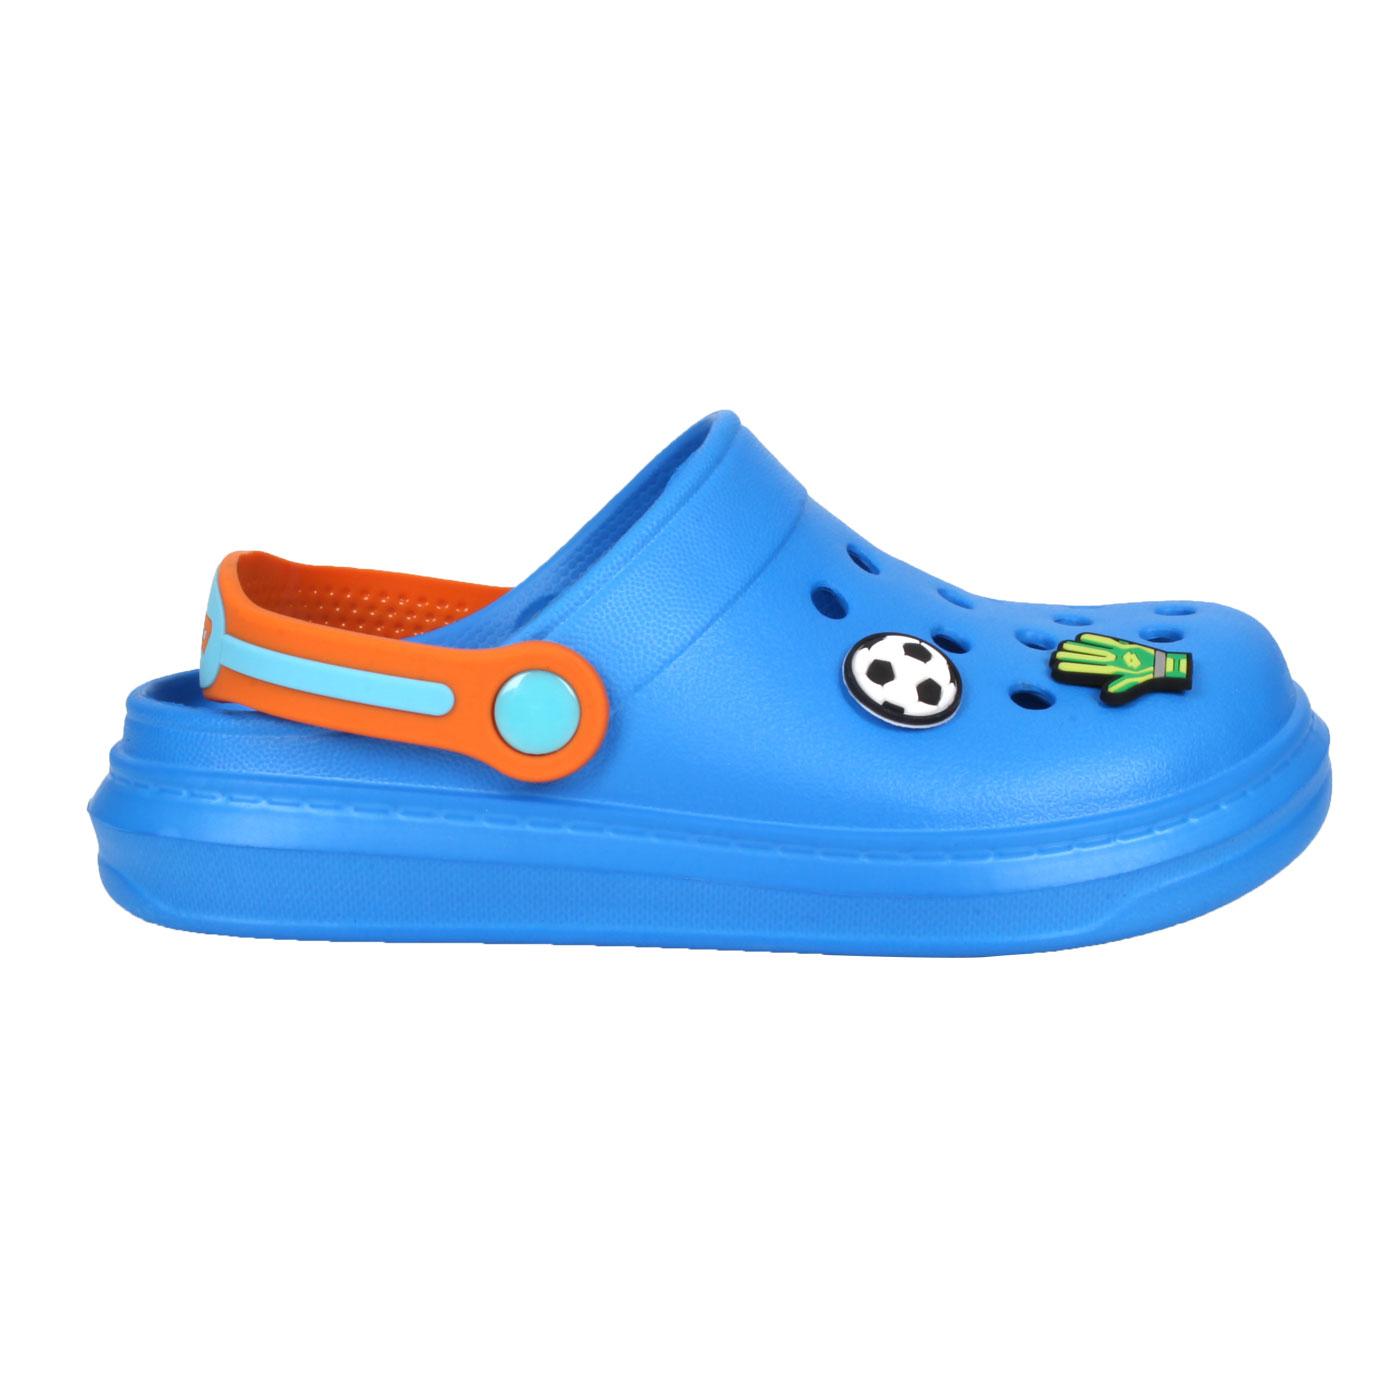 LOTTO 中童FANO清涼拖鞋 LT1AKS3086 - 藍橘白綠